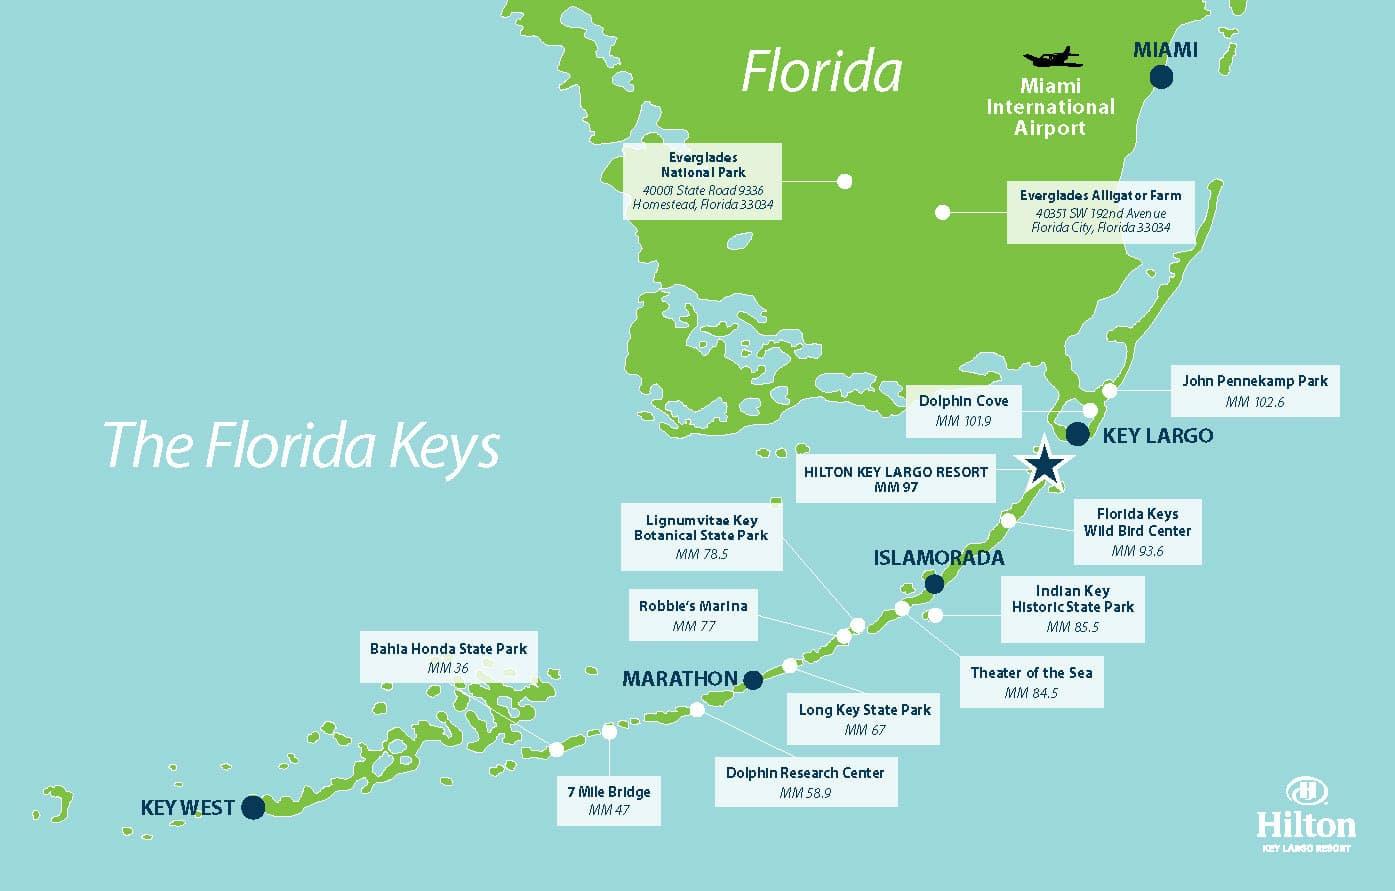 Key Largo wallpapers, Movie, HQ Key Largo pictures | 4K ... on miami florida map, medulla florida map, boca chita key florida map, marquesas keys florida map, ocala florida map, sombrero beach florida map, bradenton florida map, all of the florida keys map, islamorada florida map, bahia honda florida map, shark key florida map, biscayne park florida map, knights key florida map, raccoon key florida map, plantation island florida map, hollywood florida map, marathon key florida map, marco island florida map, best florida reef map, tavernier islands map,